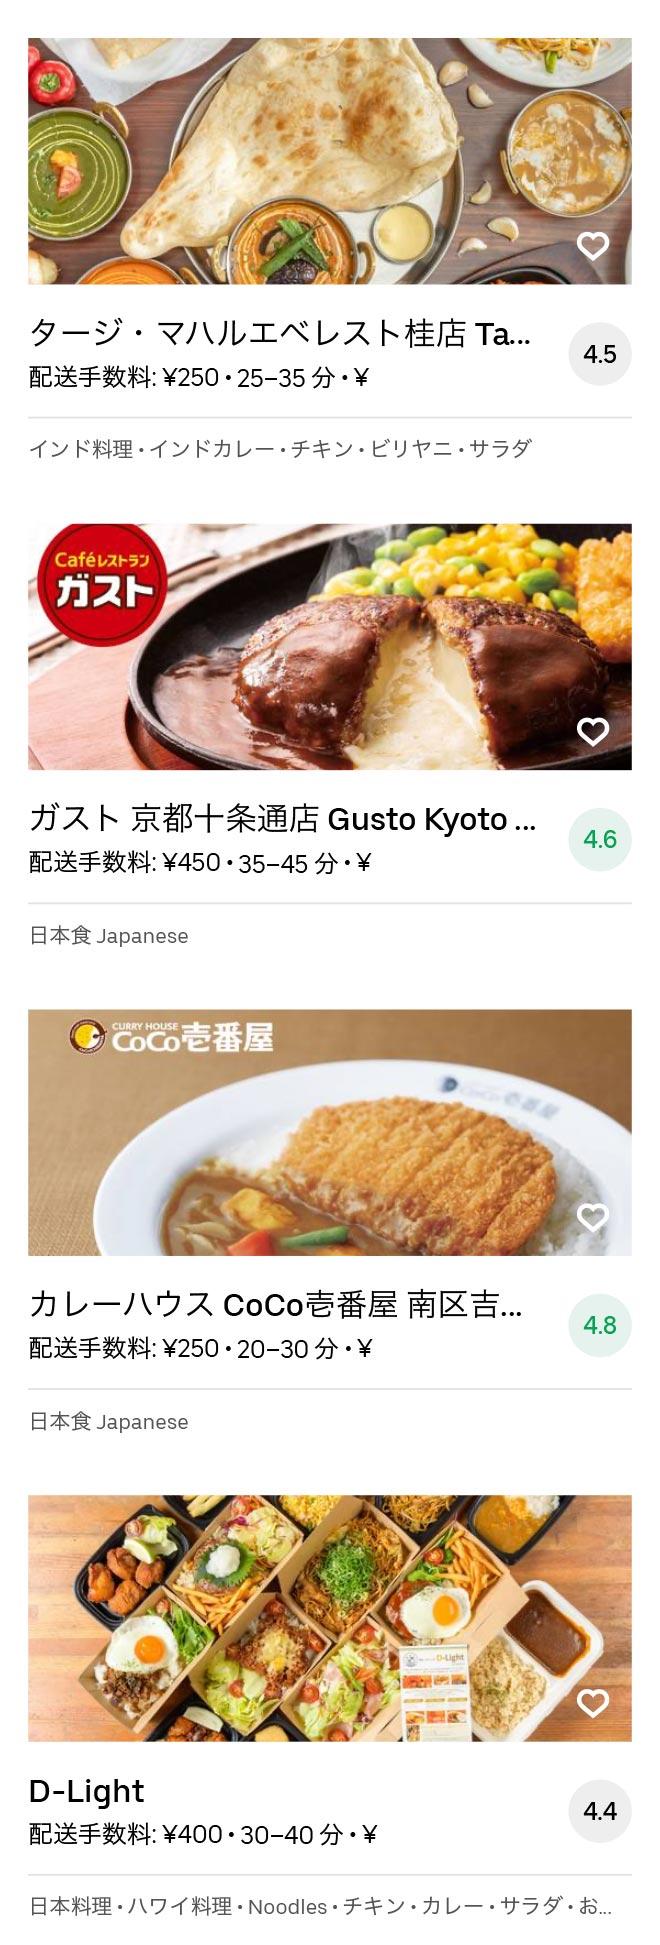 Mukoumachi menu 2008 04